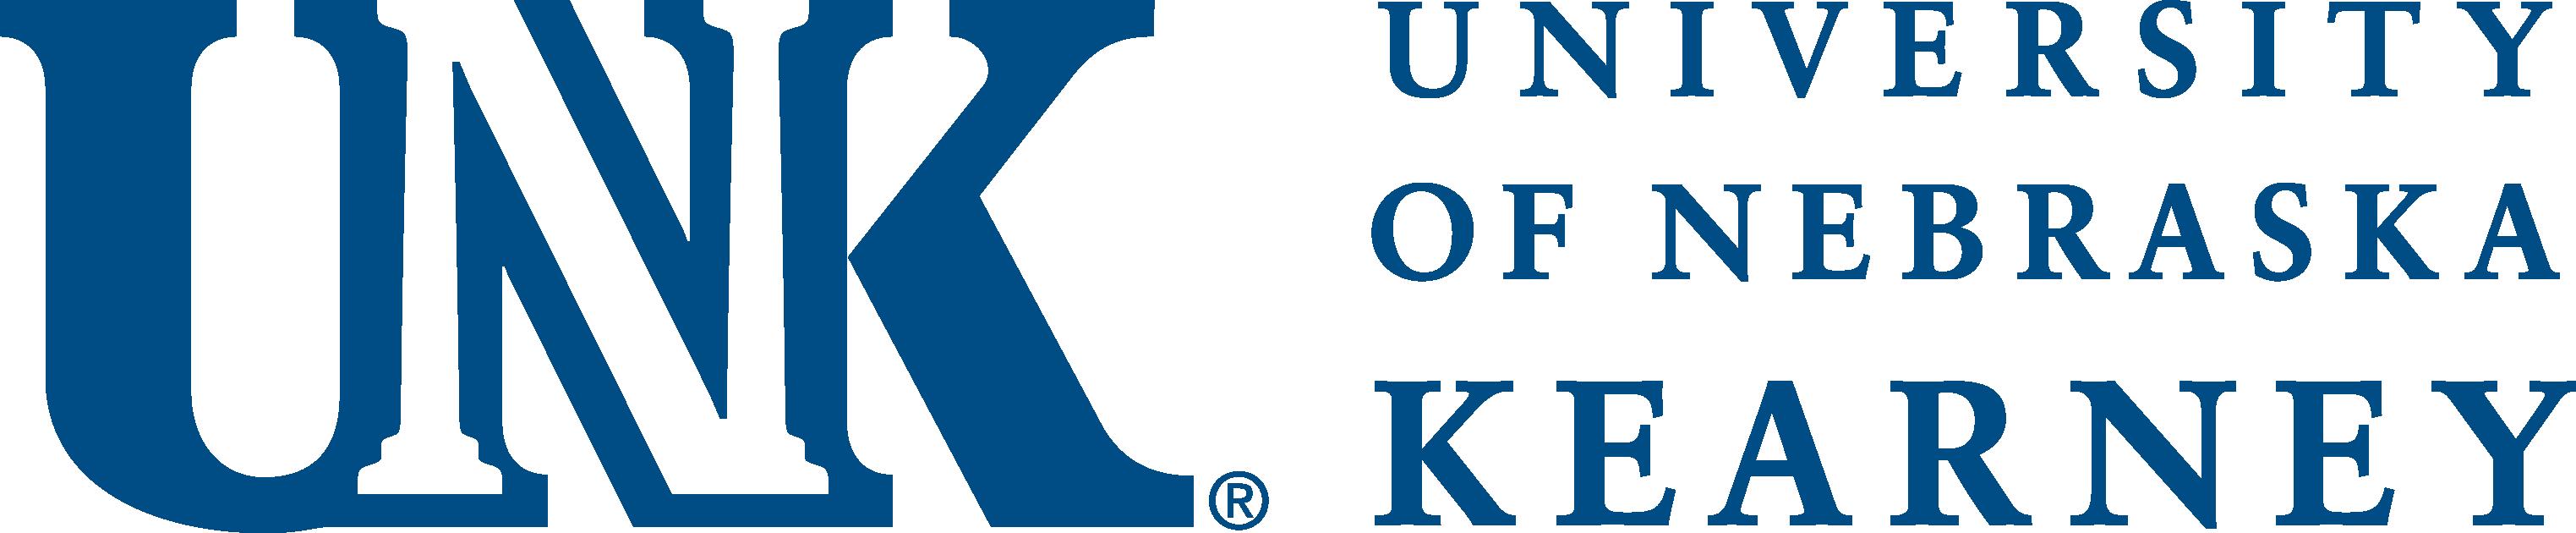 University of Nebraska Kearney Logo